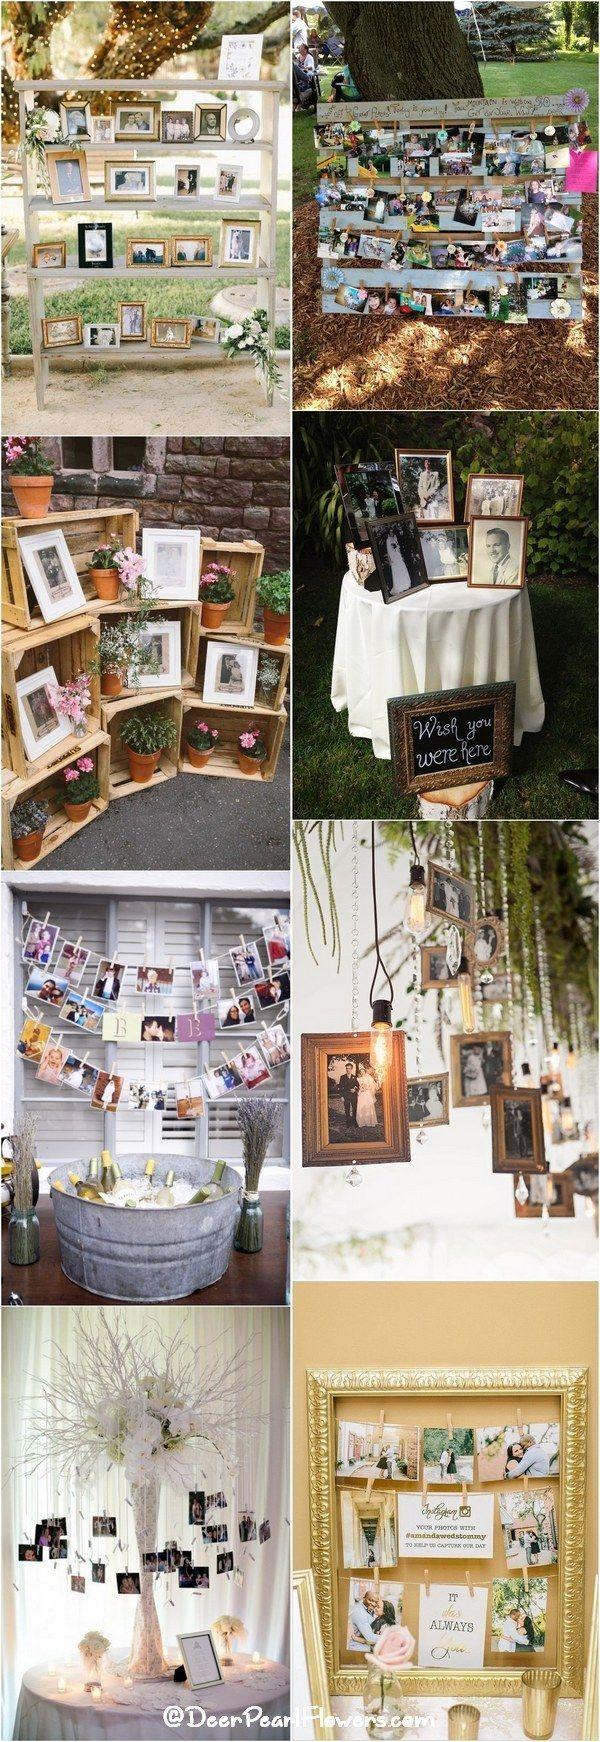 rustic wedding photo display wedding decor ideas / http://www.deerpearlflowers.com/wedding-photo-display-ideas/